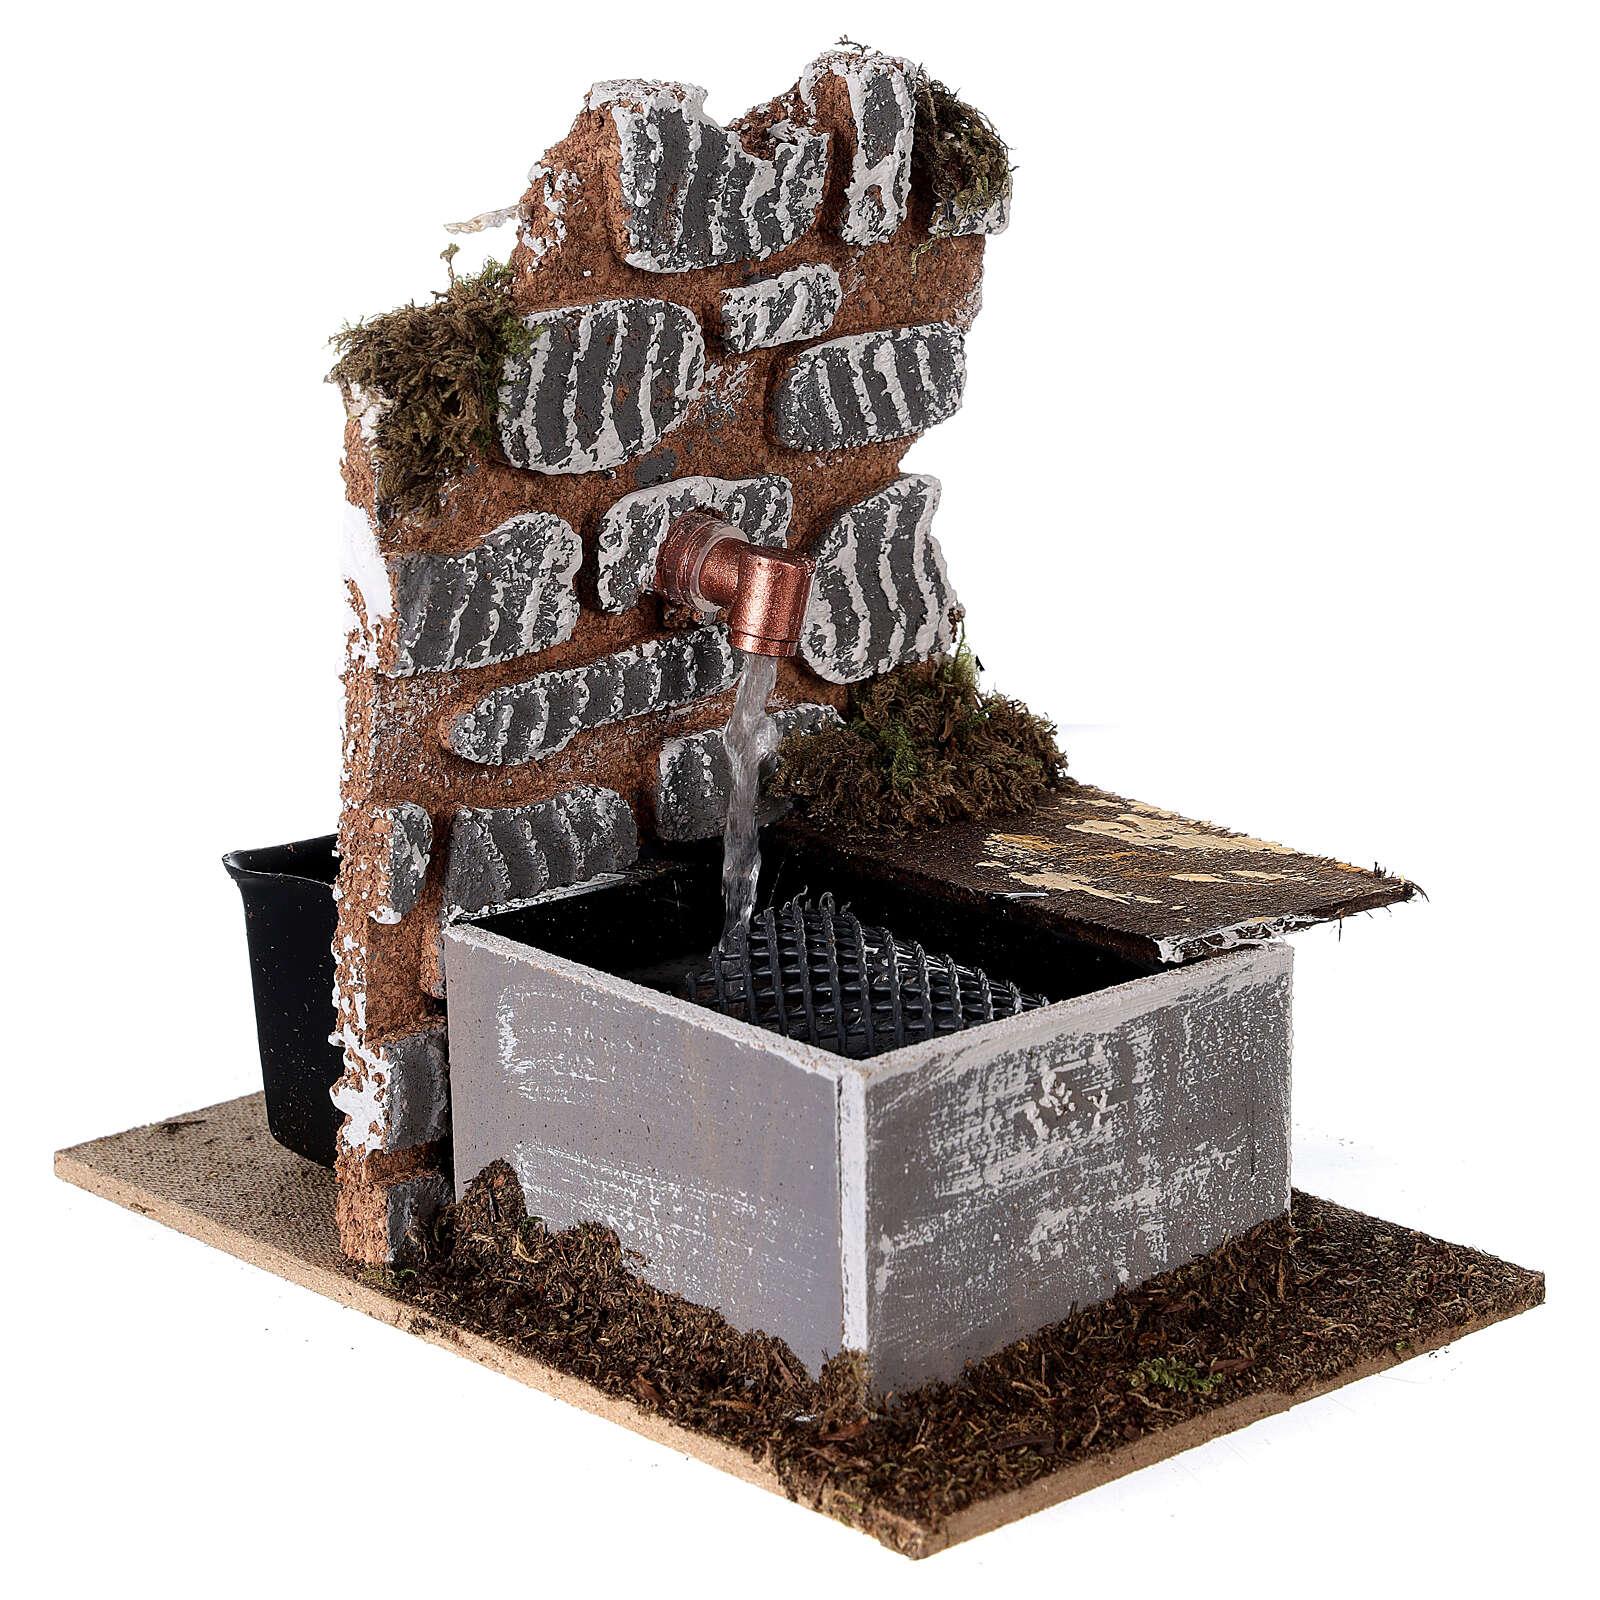 Fountain with pump 15x10x15 cm miniature nativity scene - 10-12 cm 4